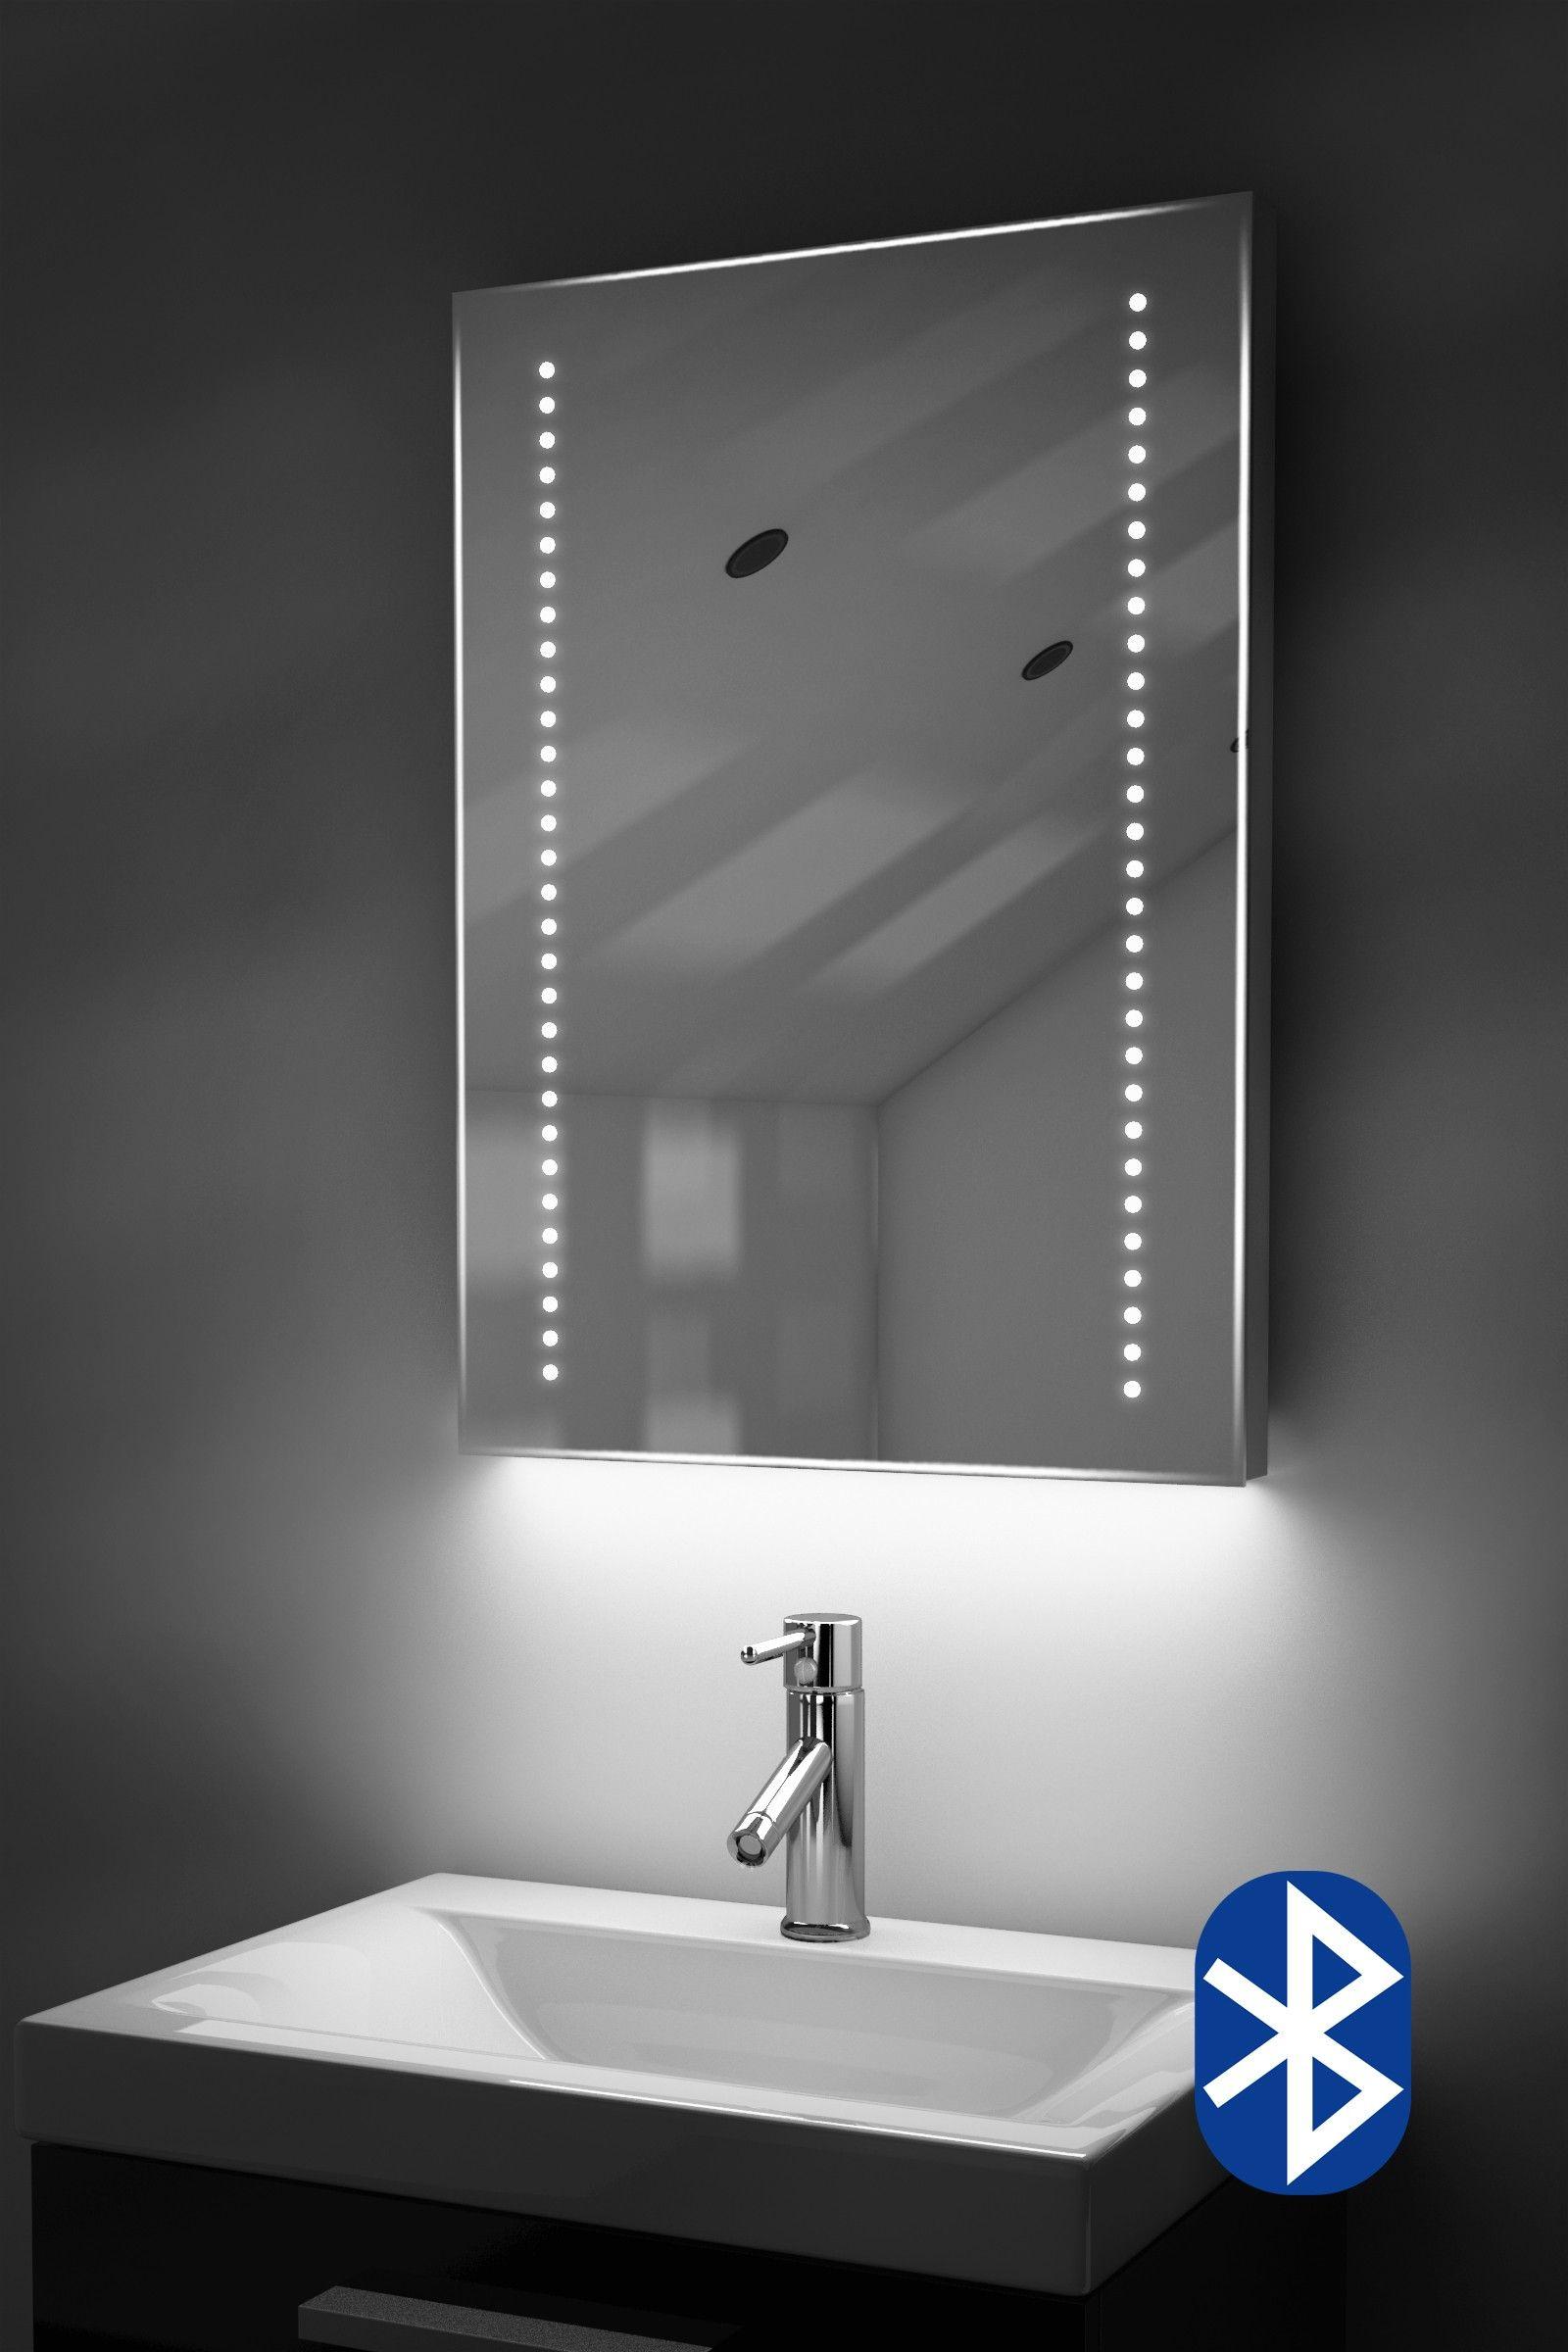 AMB k10s Audio Shaver Illuminated mirrors, Mirrors uk